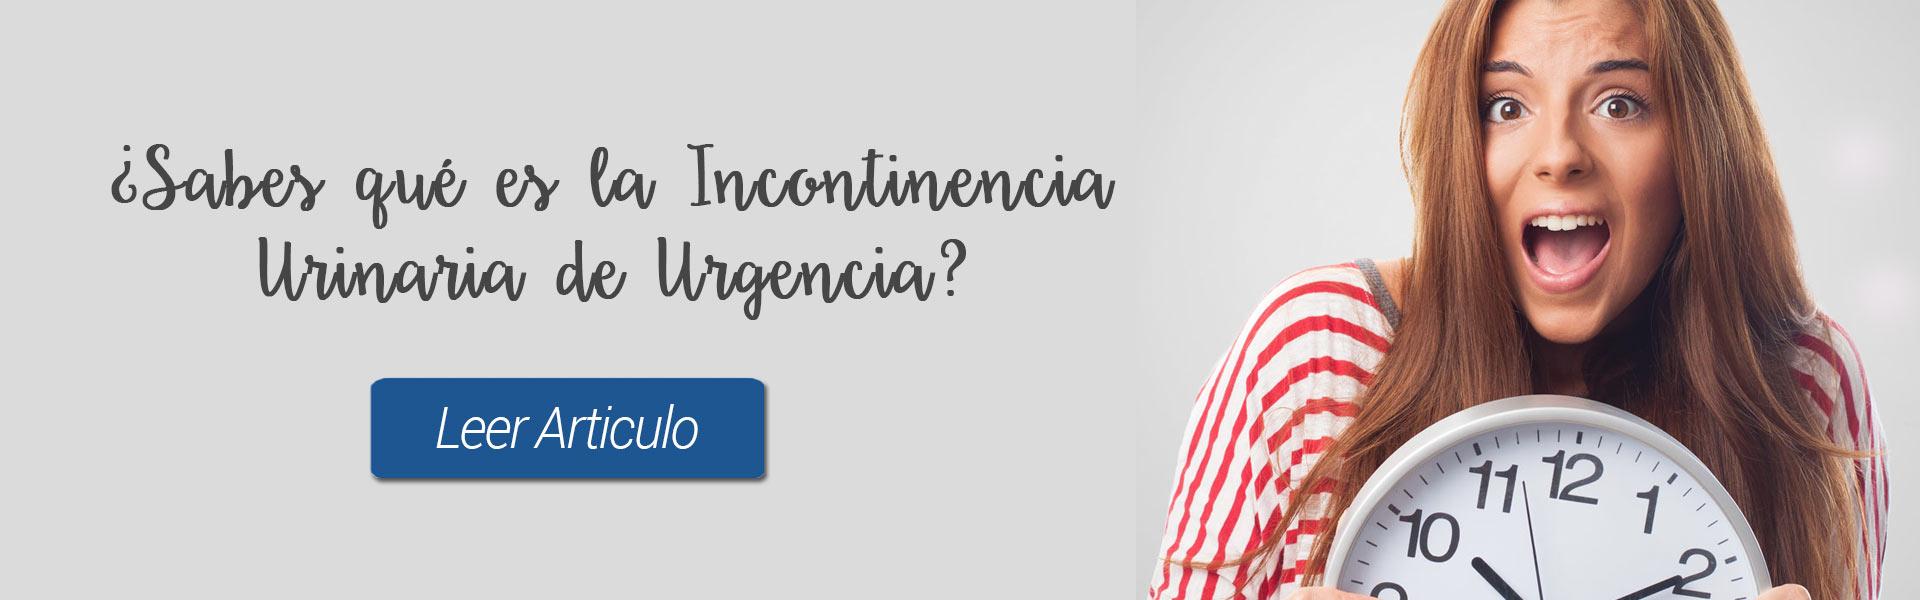 Blog Incontinencia Urinaria